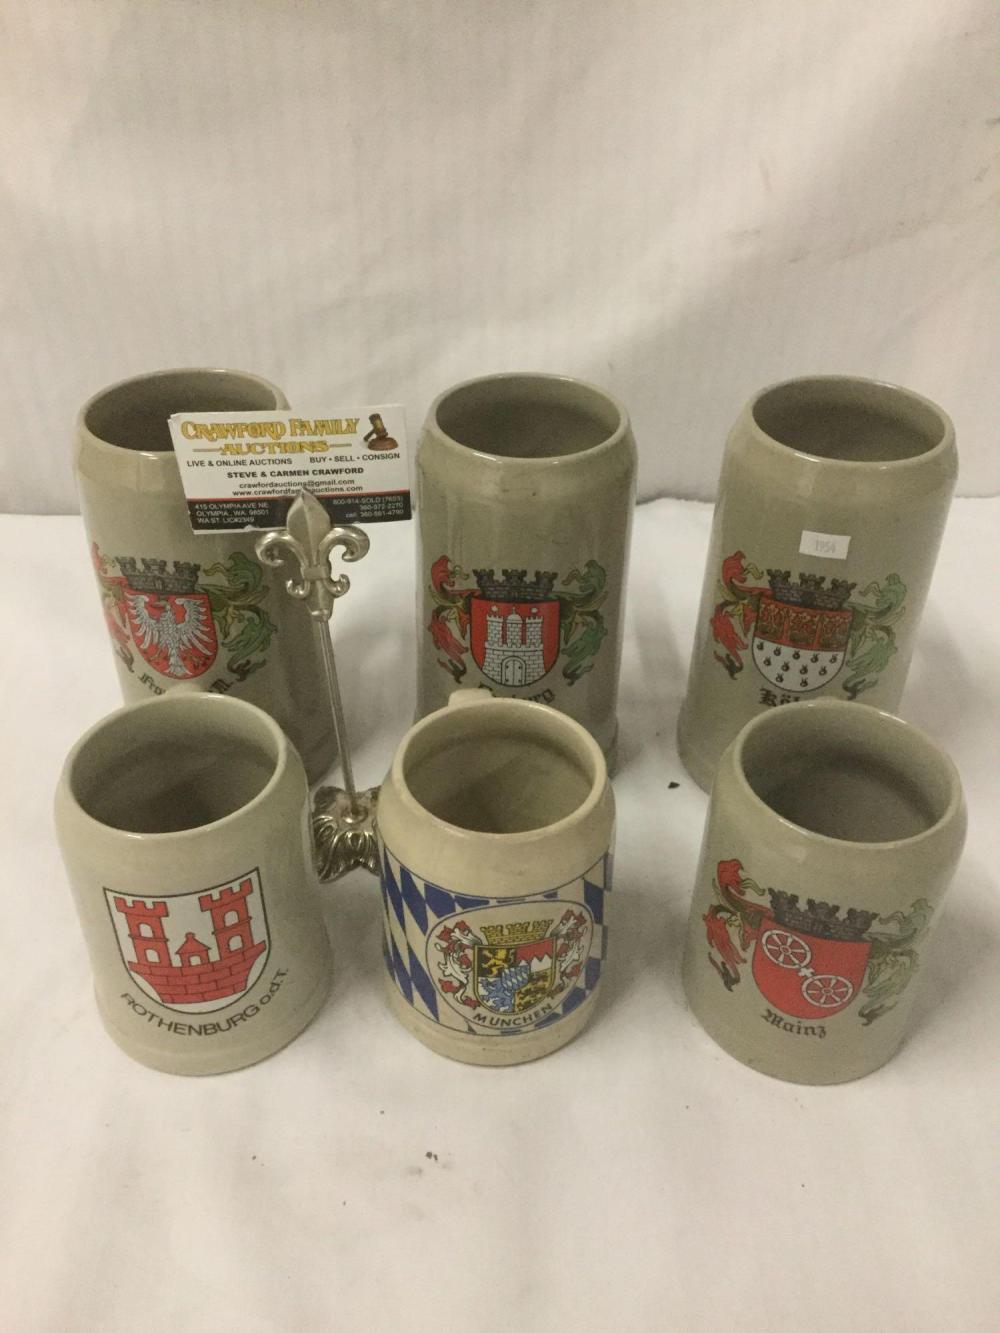 Lot 194: Collection of stoneware salt glaze steins having German city coat of arms design